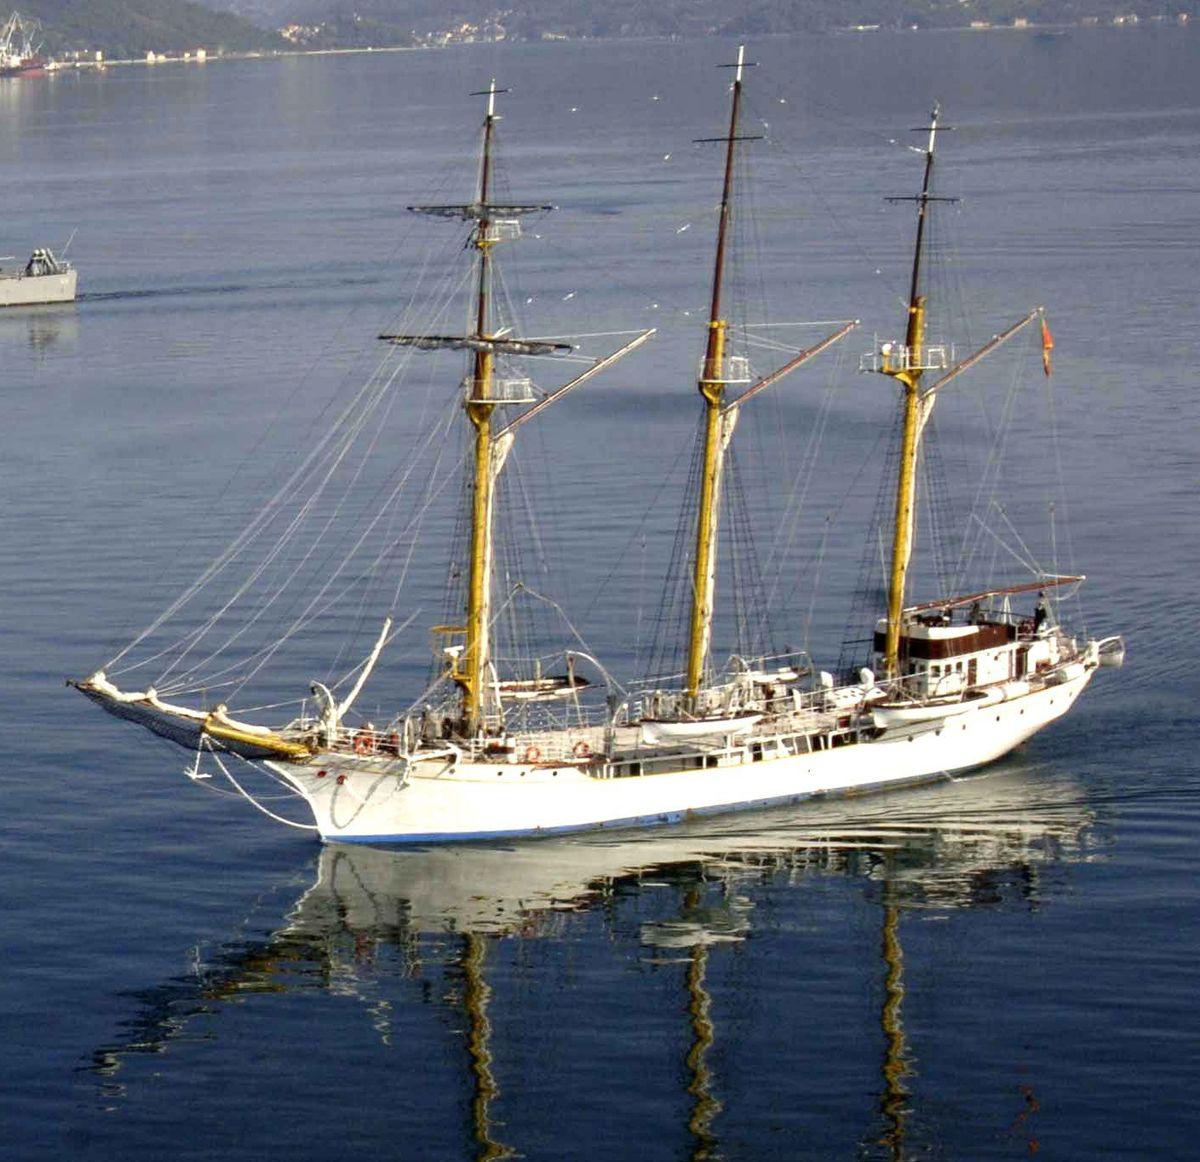 Croatia-Montenegro: Jadran ship dispute possibly close to solution